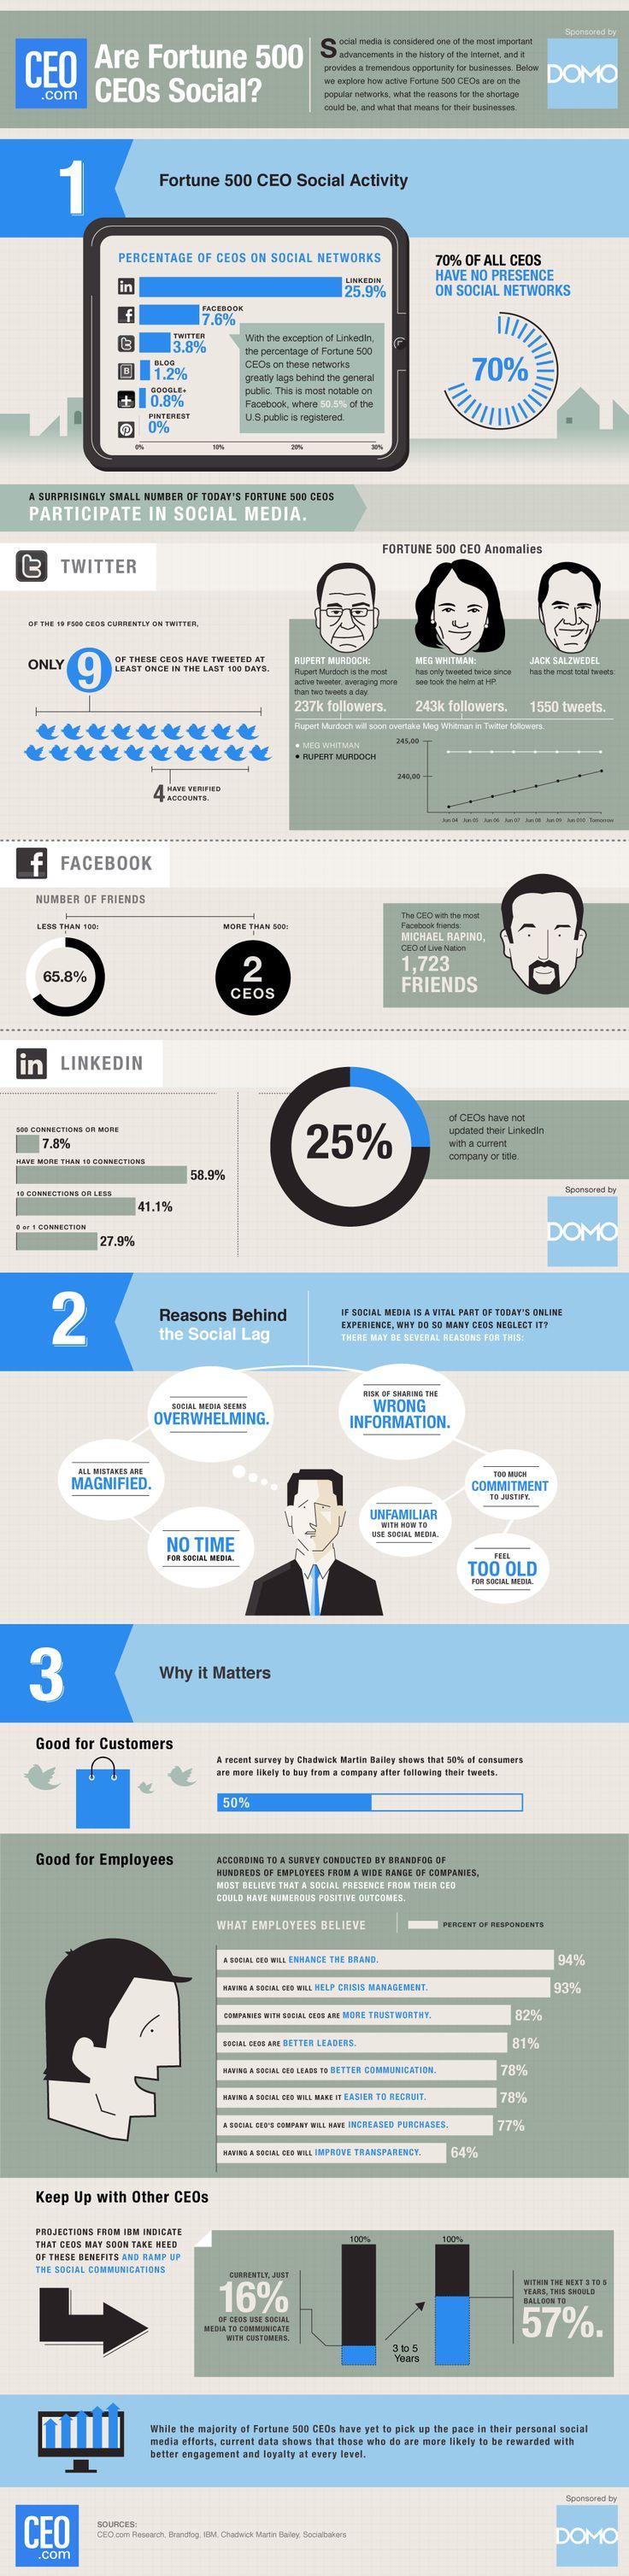 2012 CEO s Social IndexSocial Ceo, Internet Marketing, Website, Social Media Infographic, Fortune 500, Socialceo, 500 Ceo, Social Networks, Socialmedia